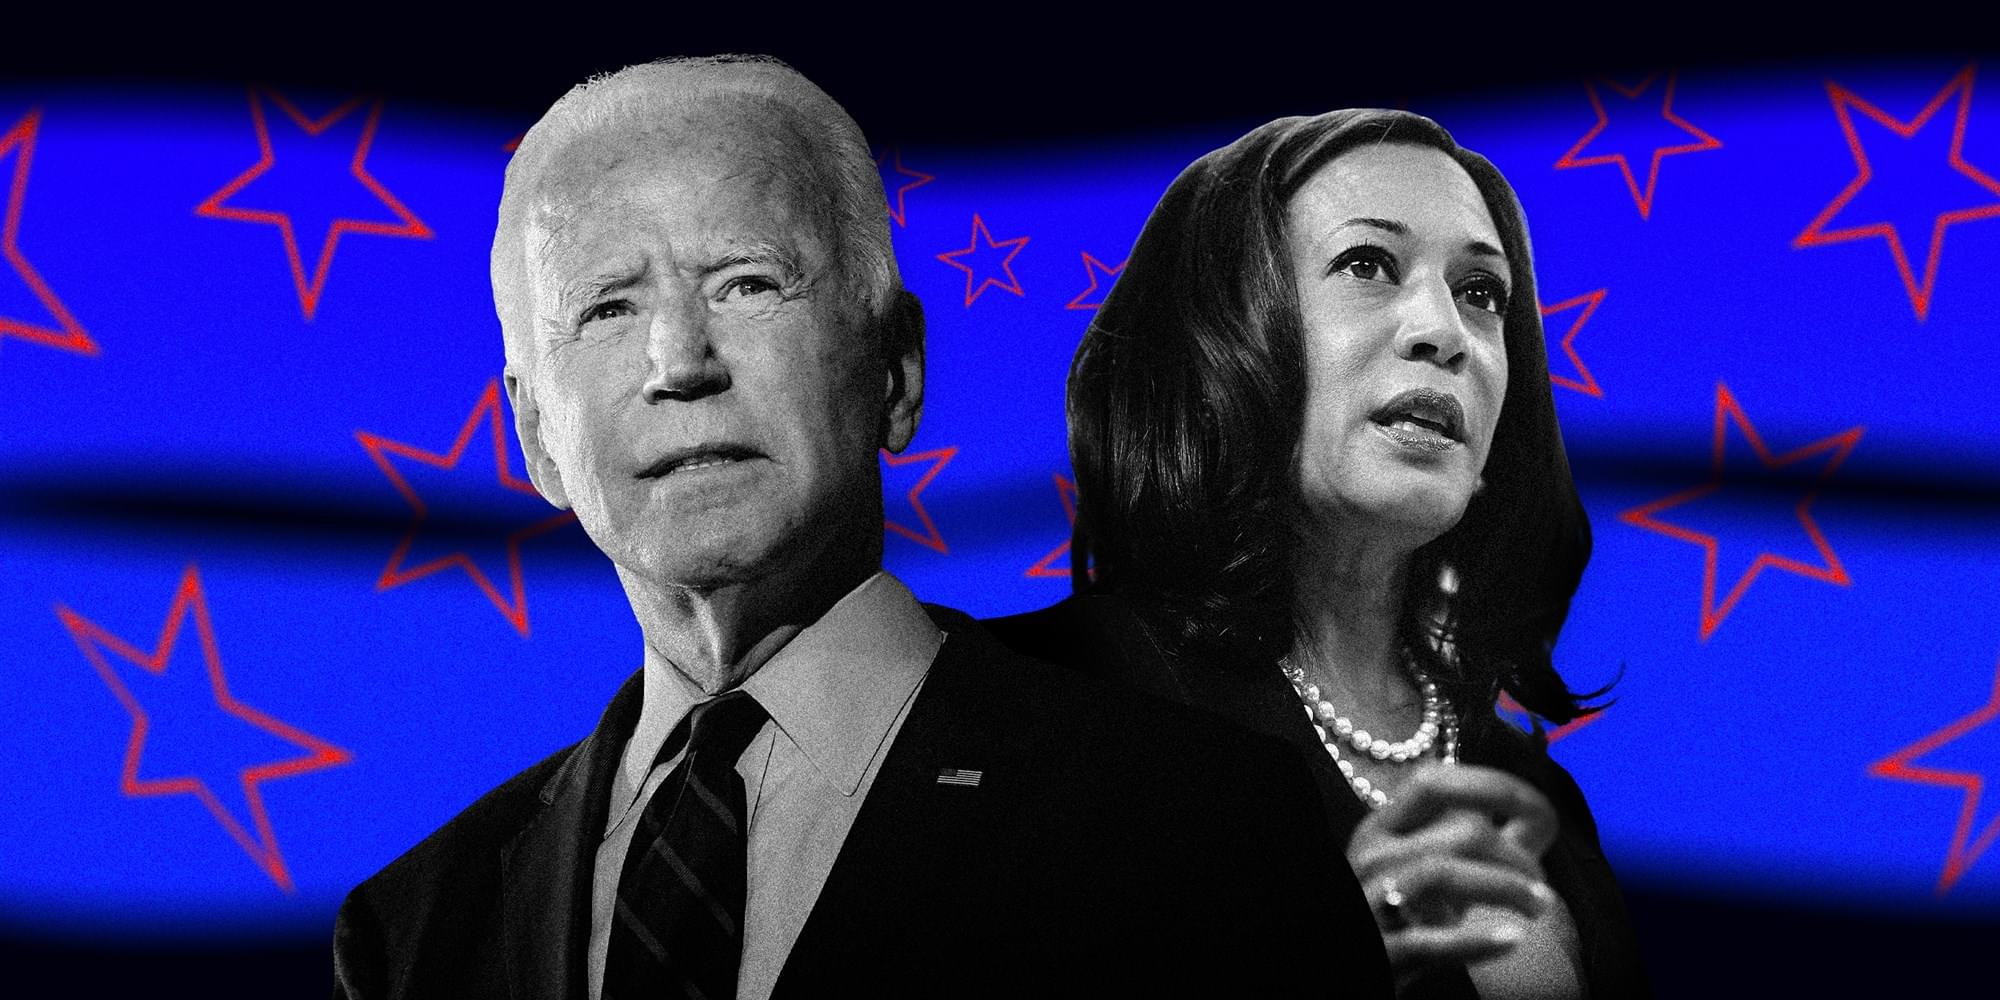 Inauguration Day 2021 highlights: Joe Biden and Kamala Harris take office